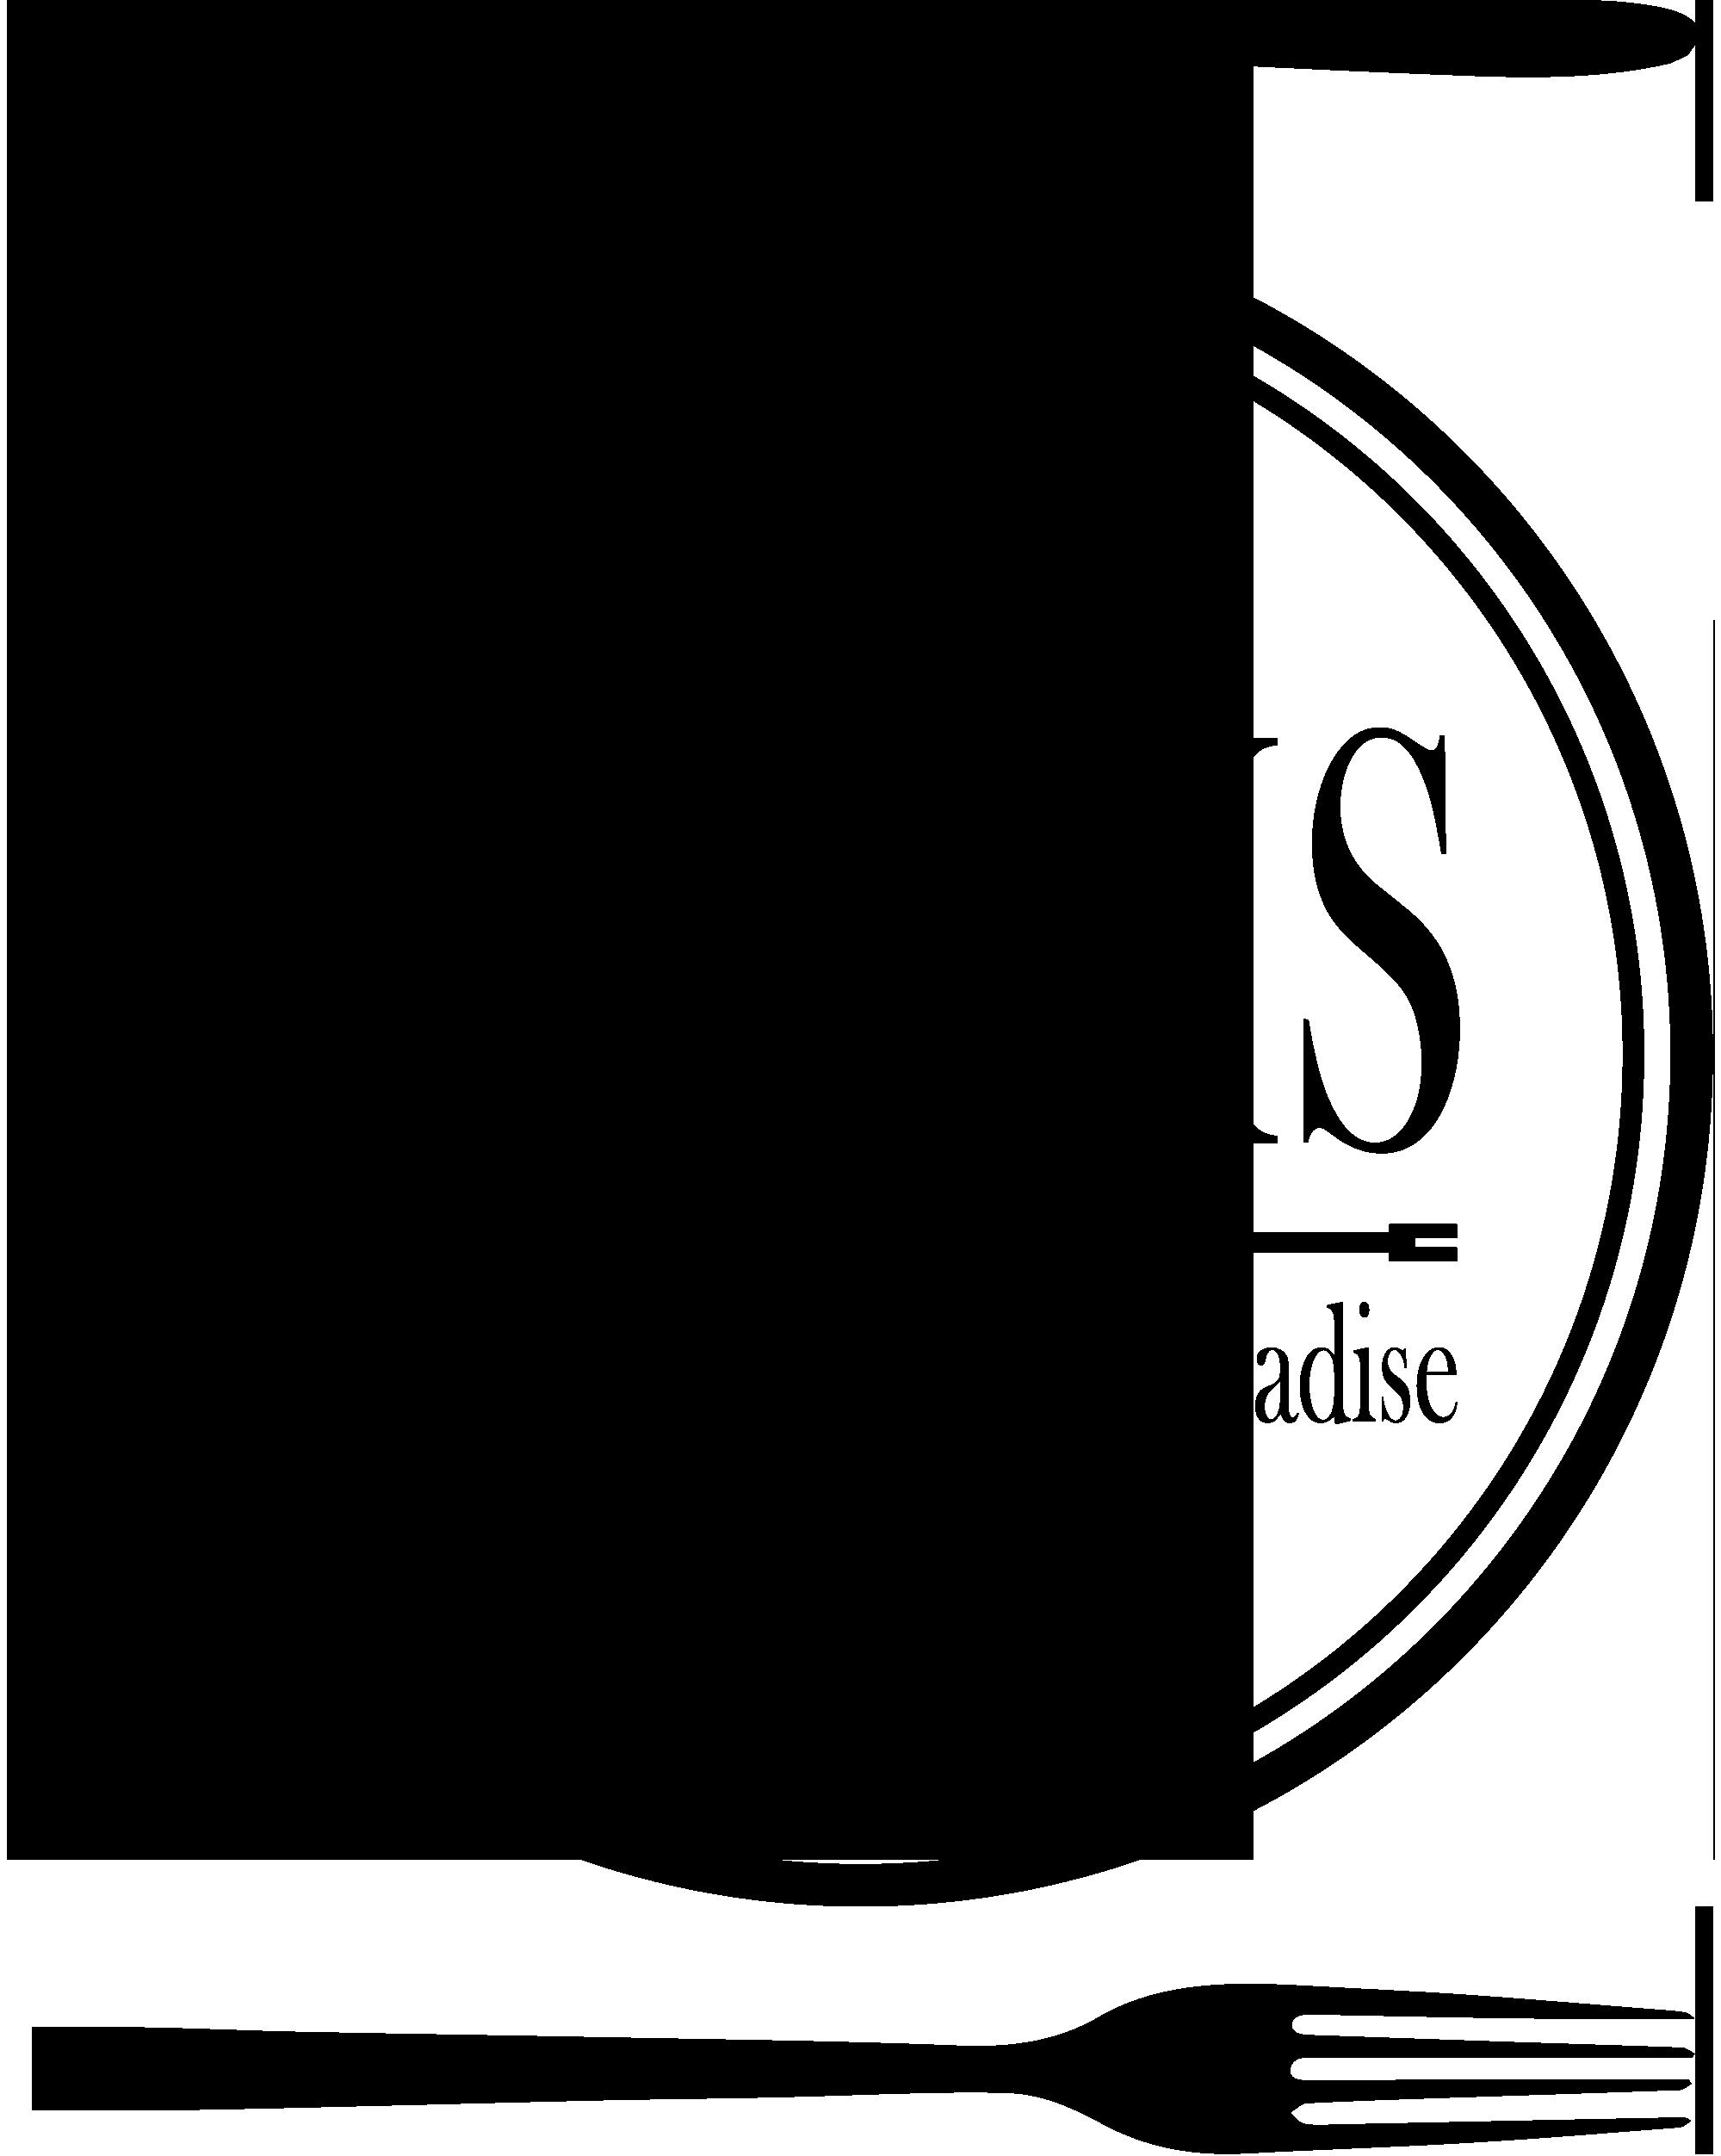 Modis